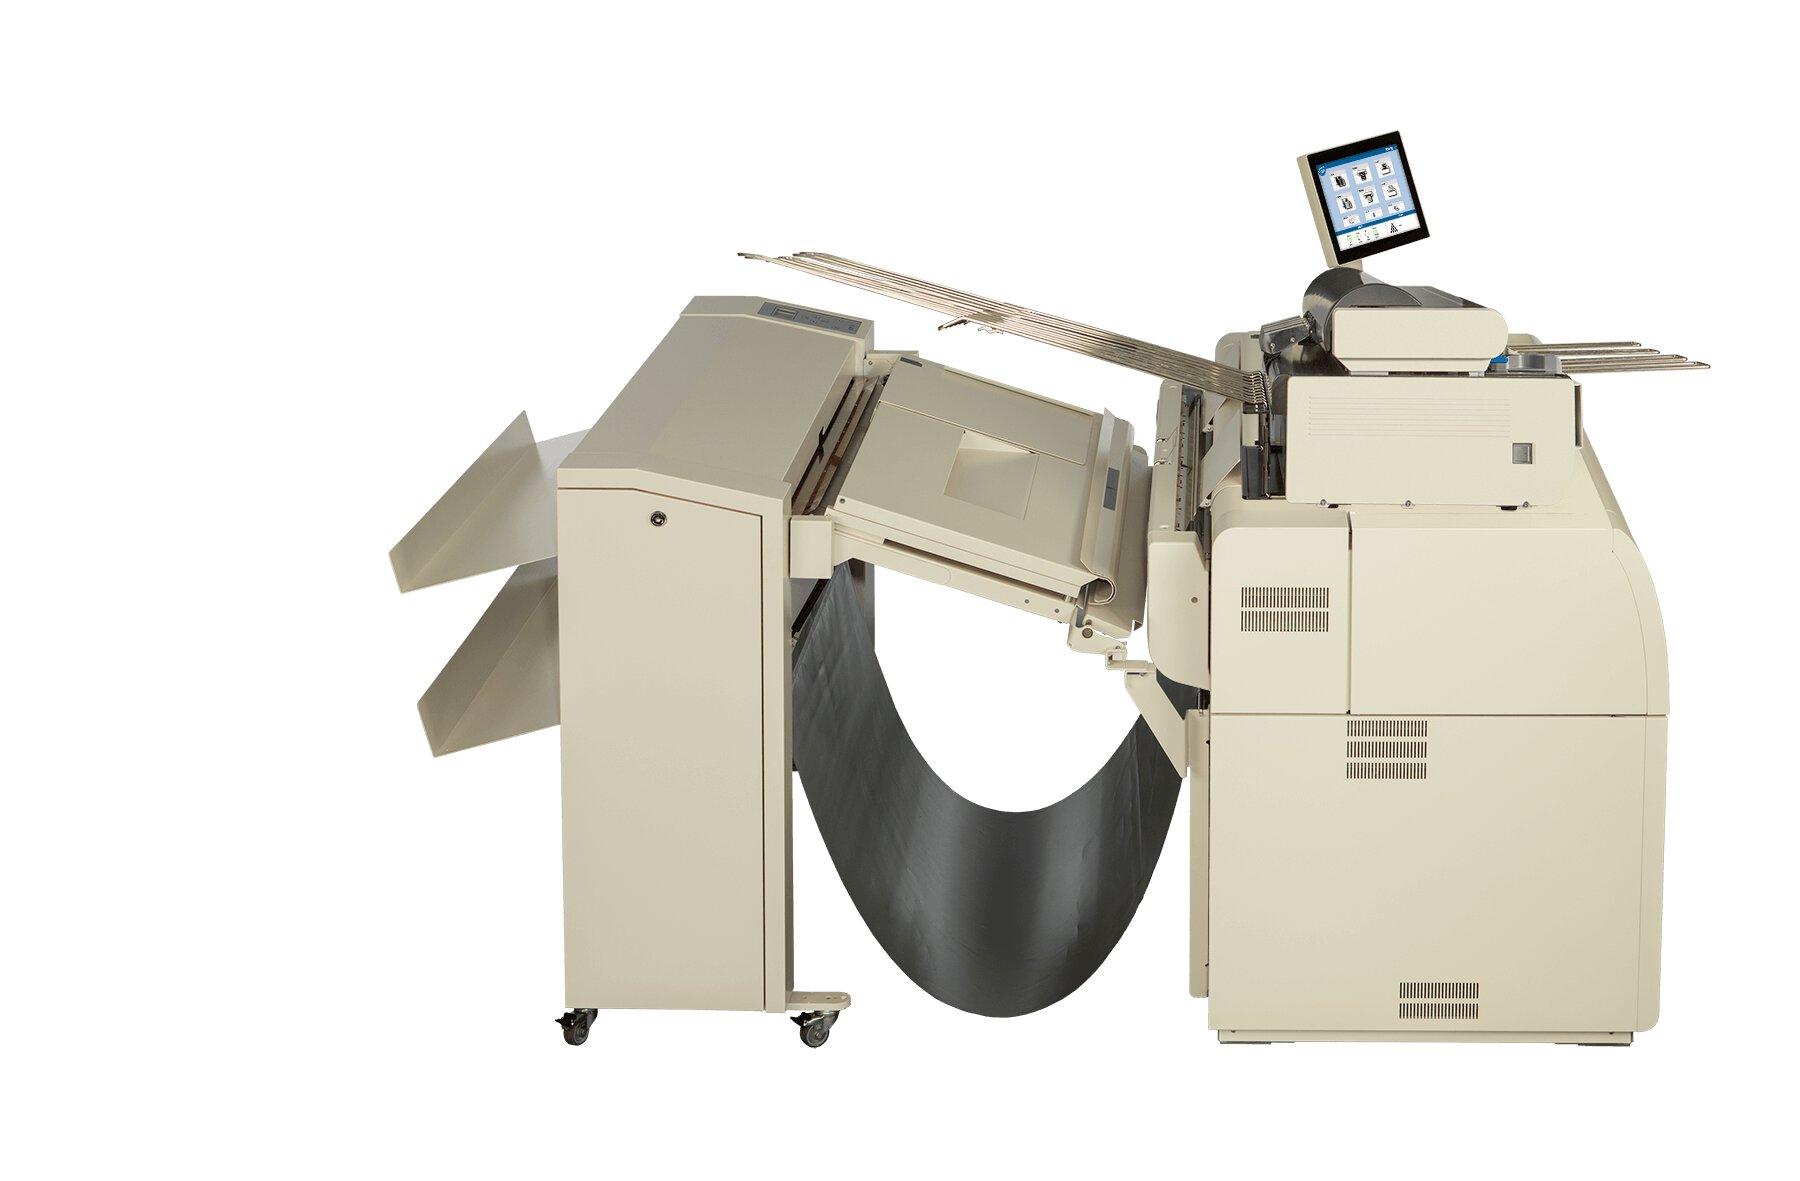 KIP 7990 professional printer